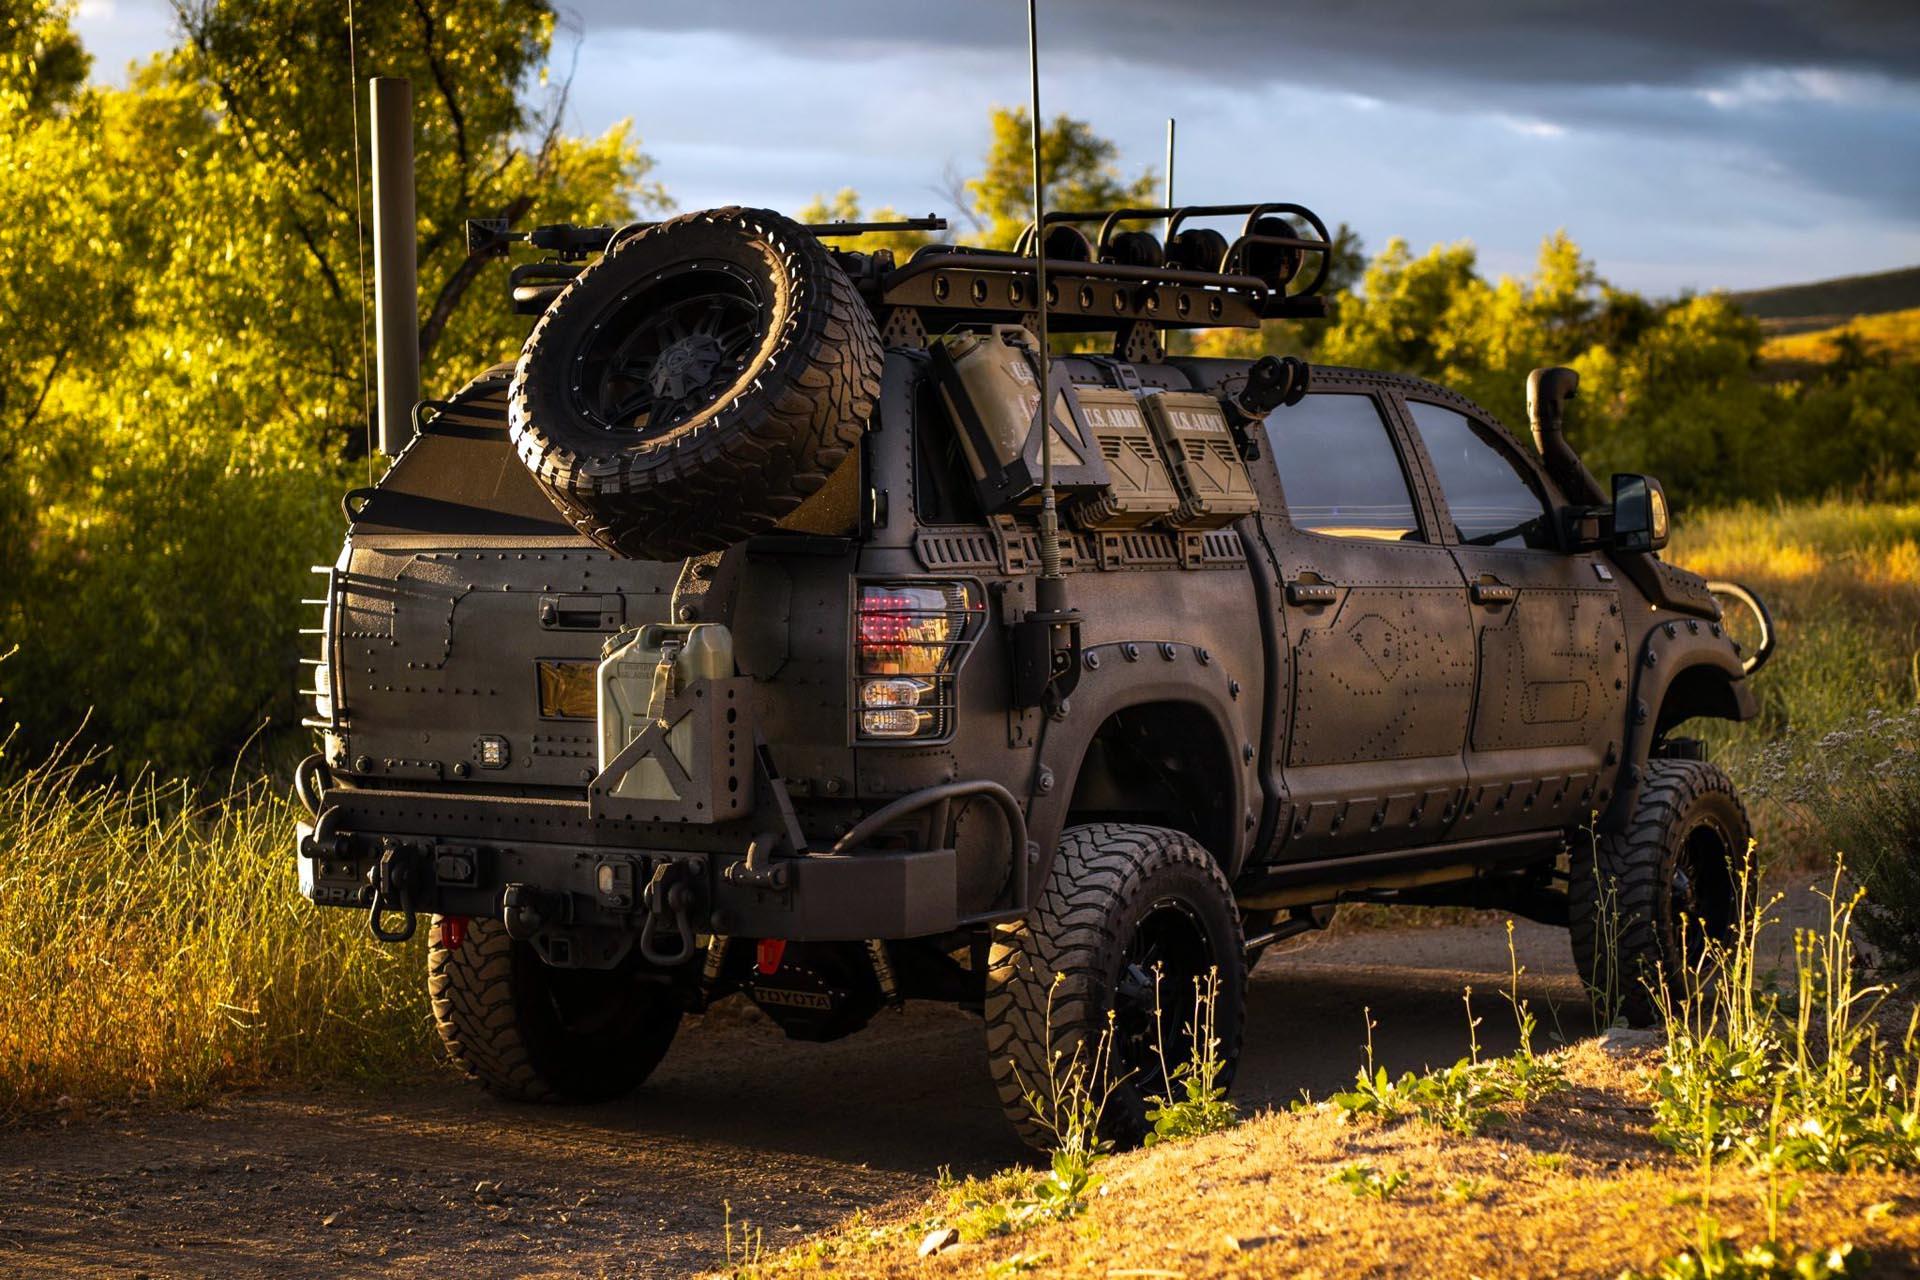 2013_toyota_custom_military_expedition_style_tundra_159222981591cd63fce5c3655bimg_7025-scaled